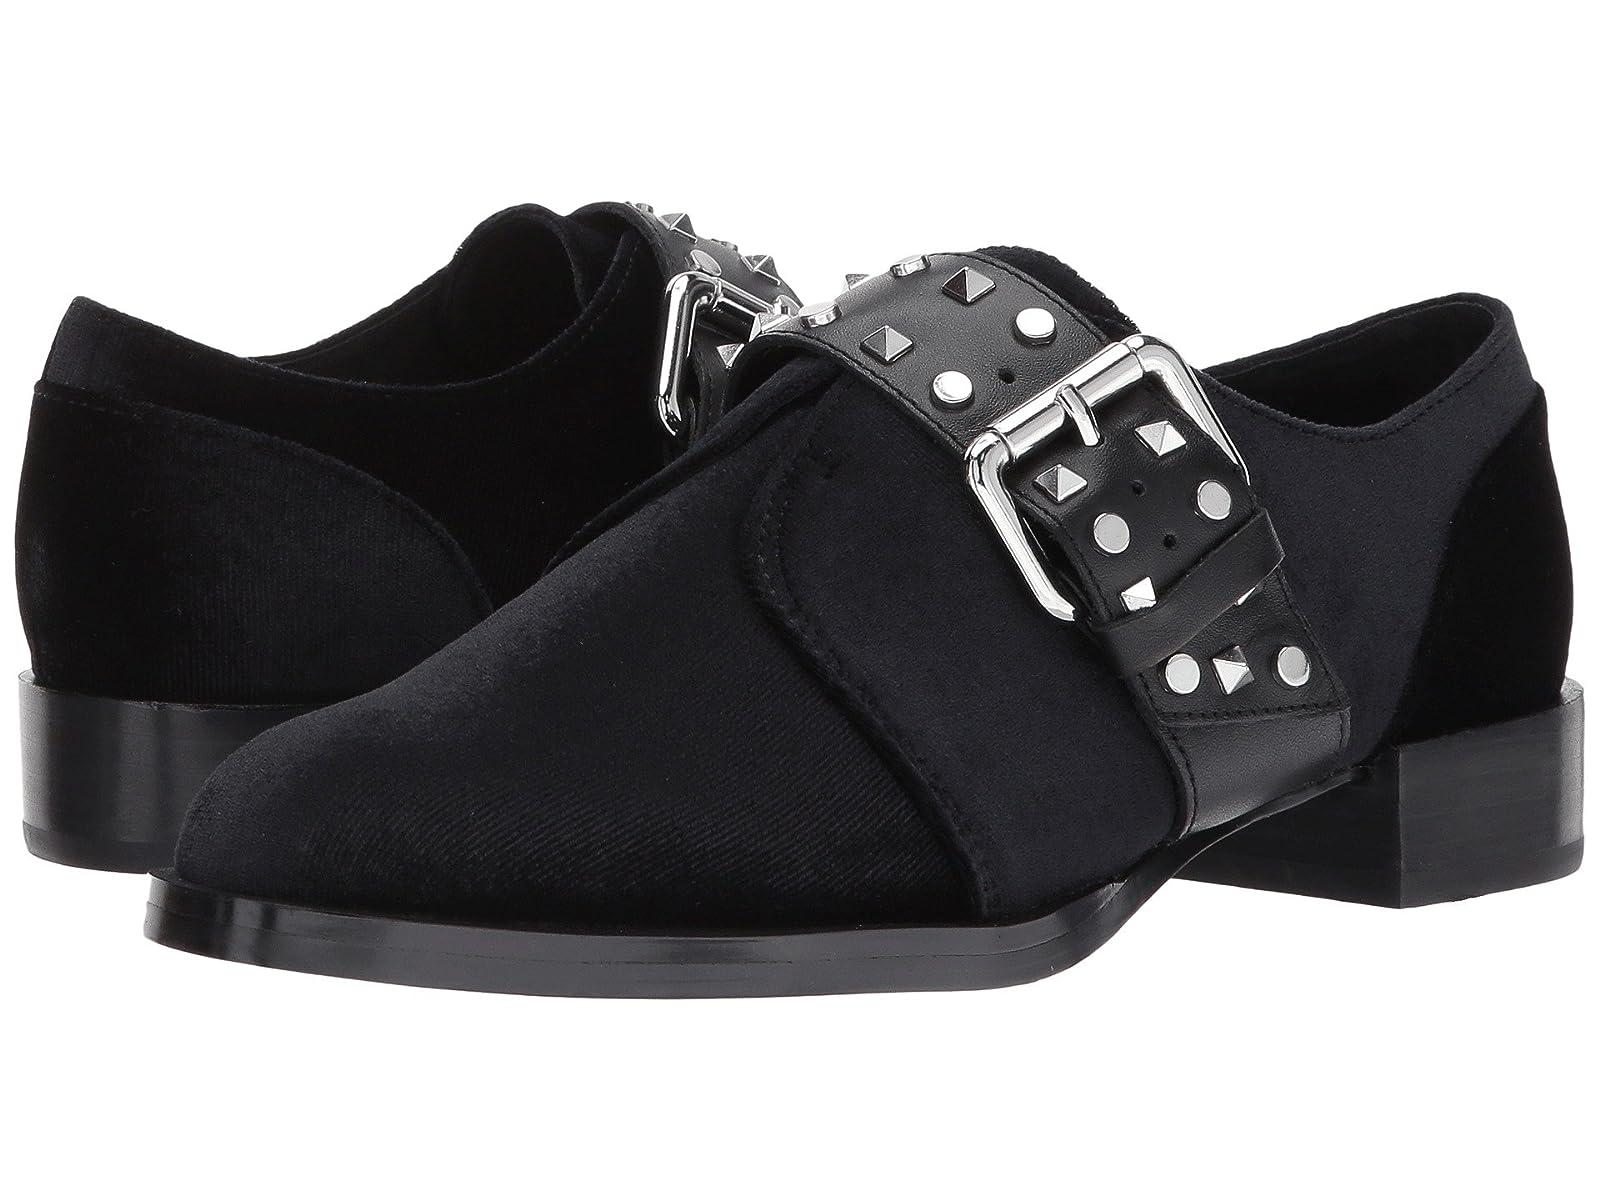 Shellys London EliotCheap and distinctive eye-catching shoes